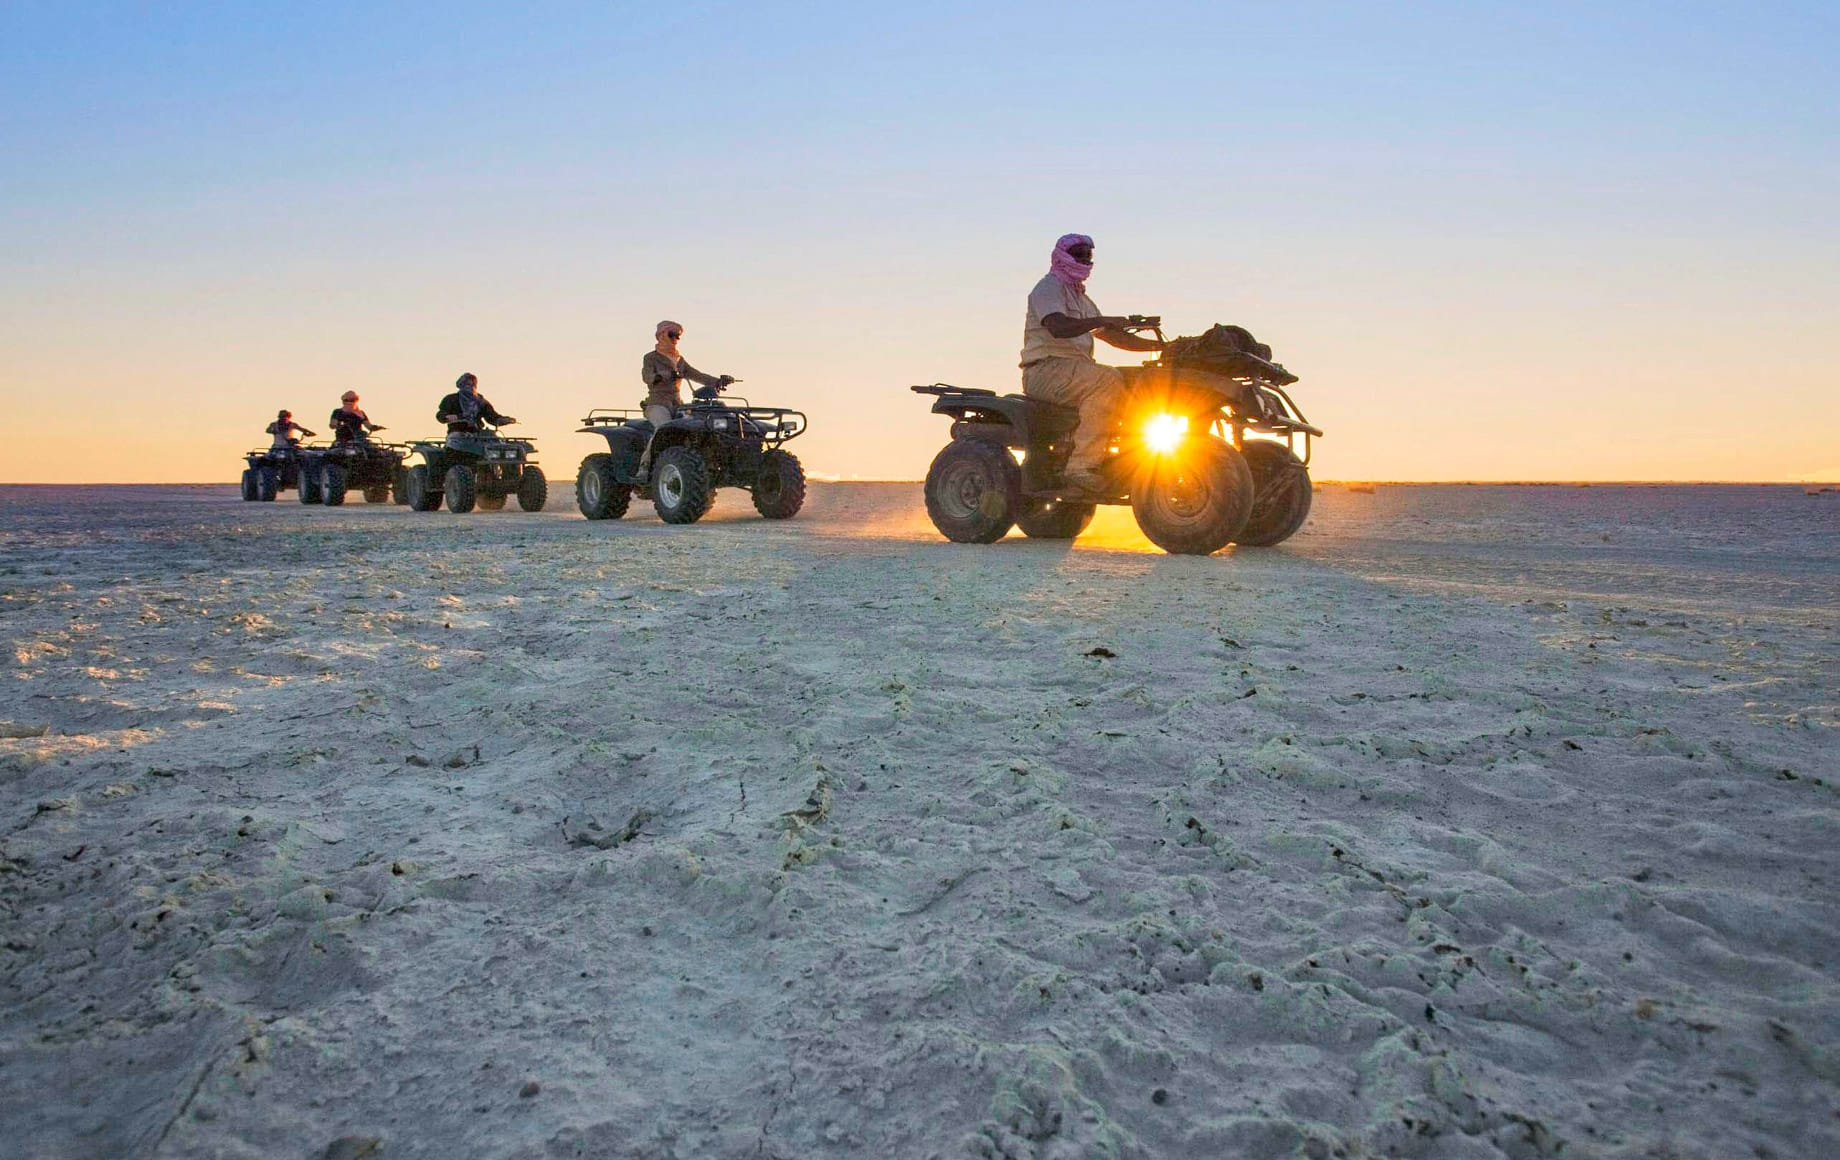 Makgadikgadi Pan, This is perfect for quad biking